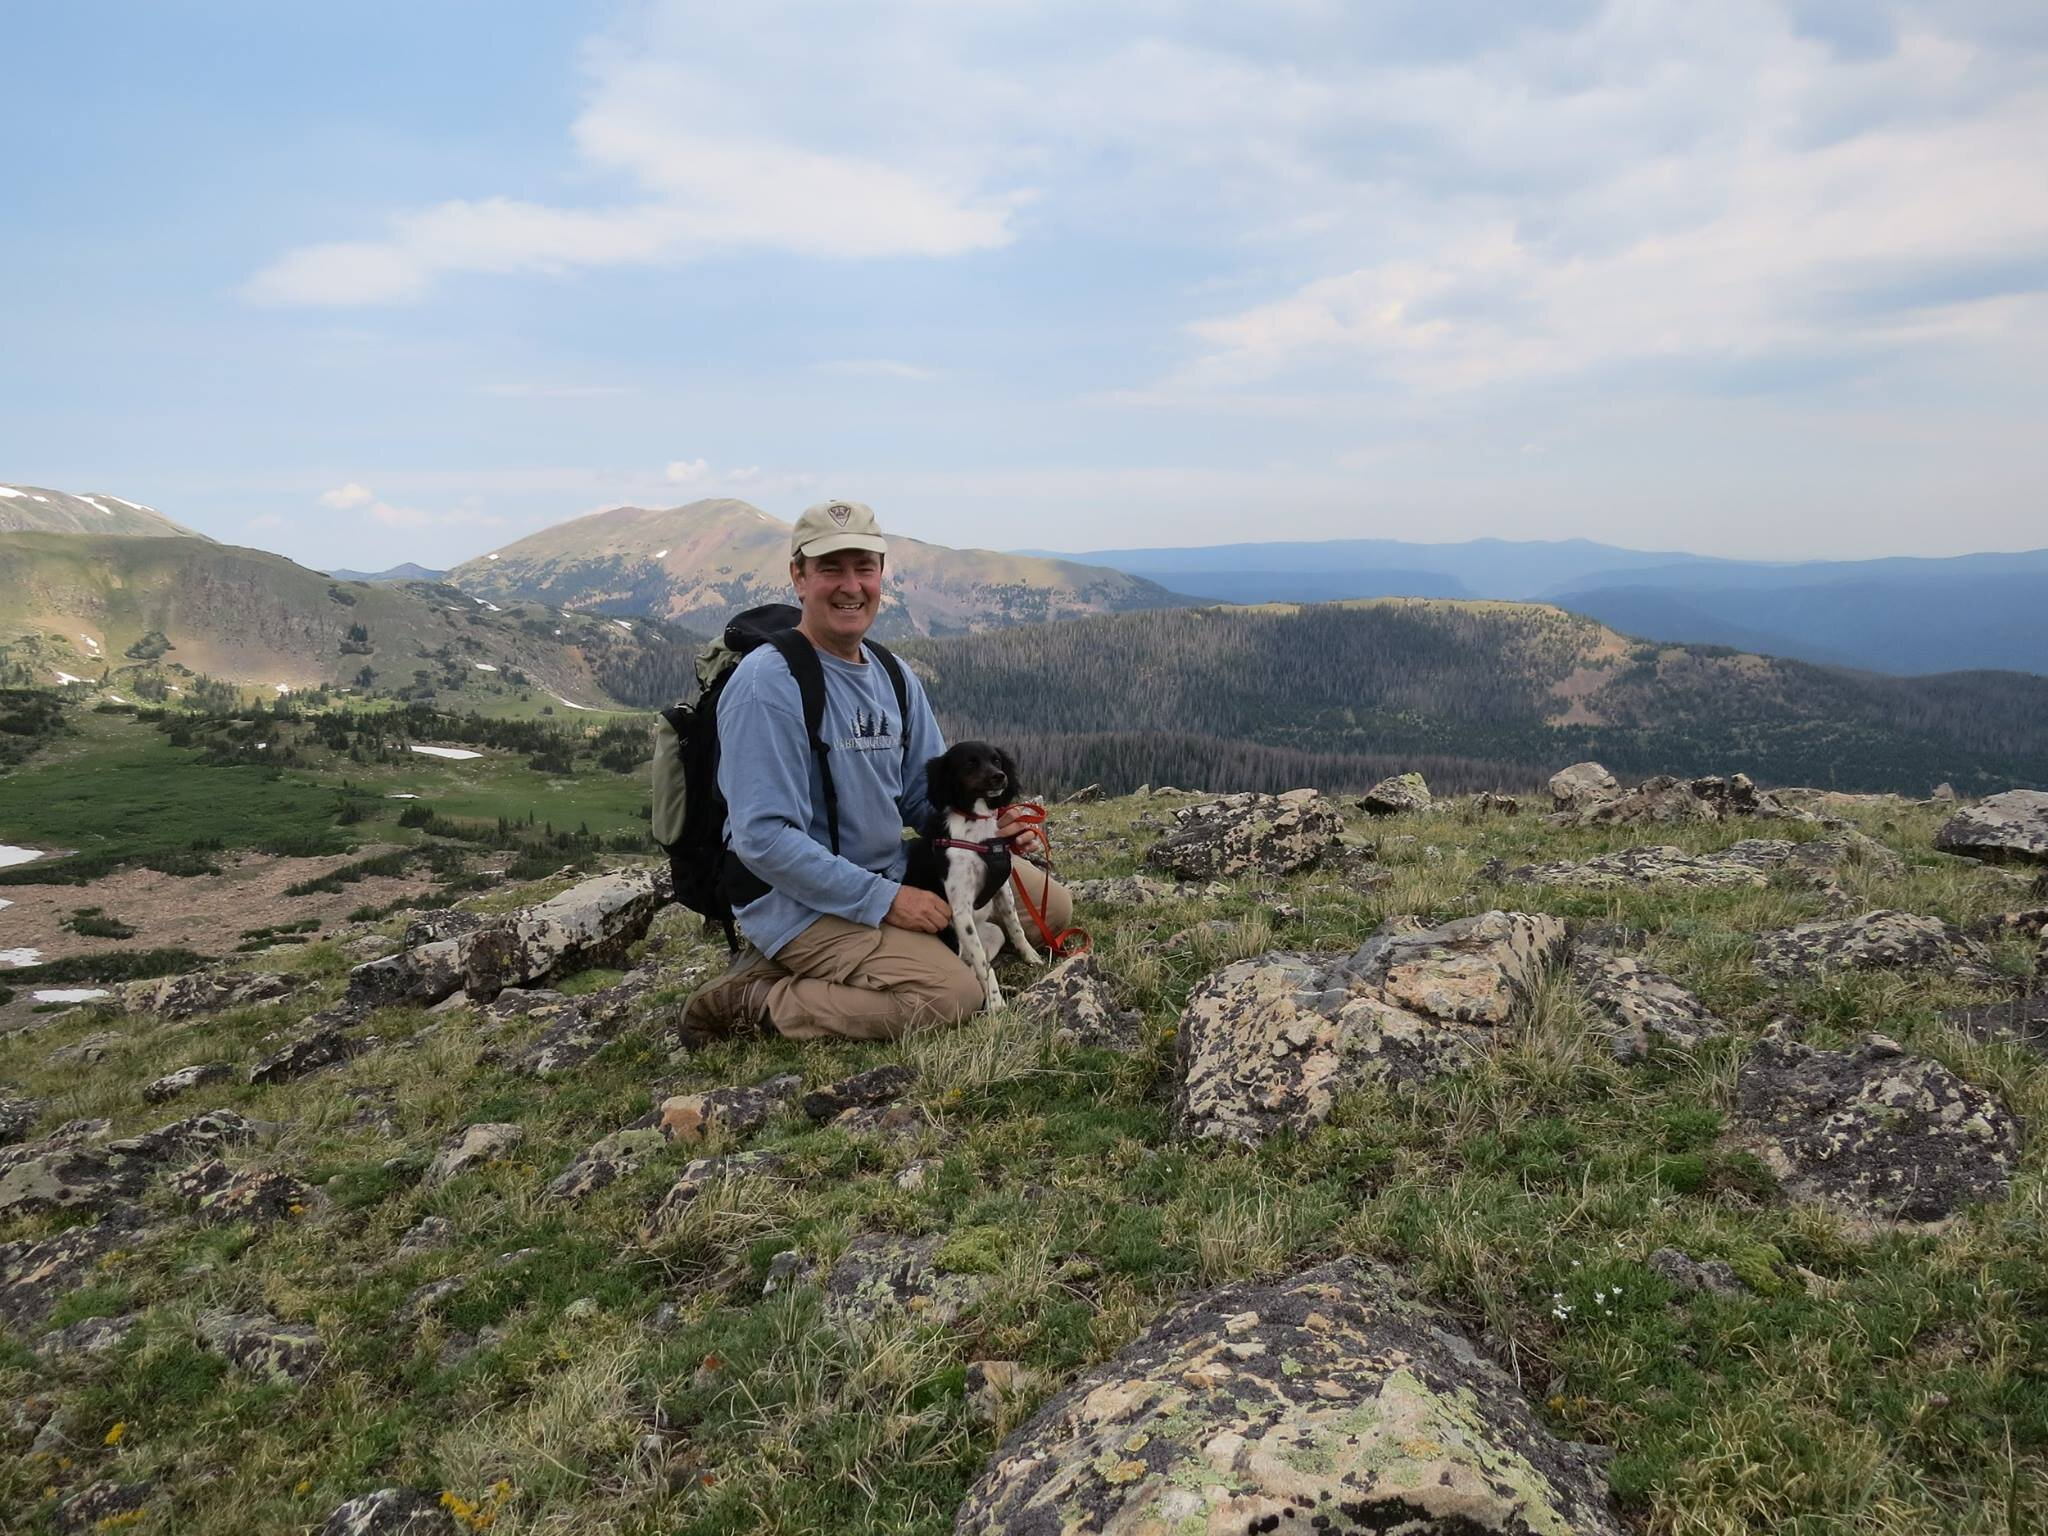 Off Trail Hiking - Rawah Wilderness, Colorado